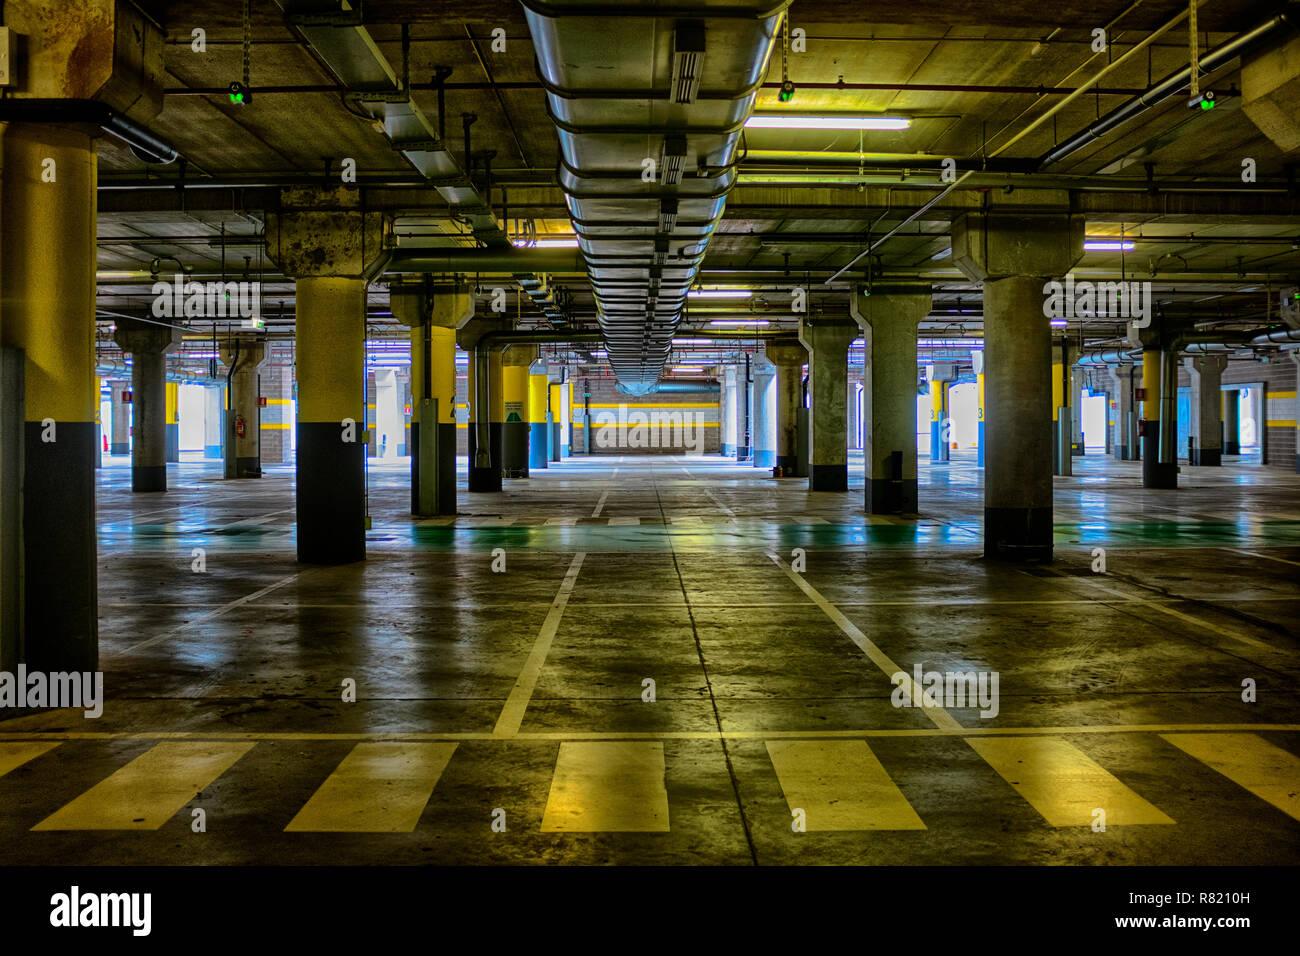 Empty parking garage - Stock Image